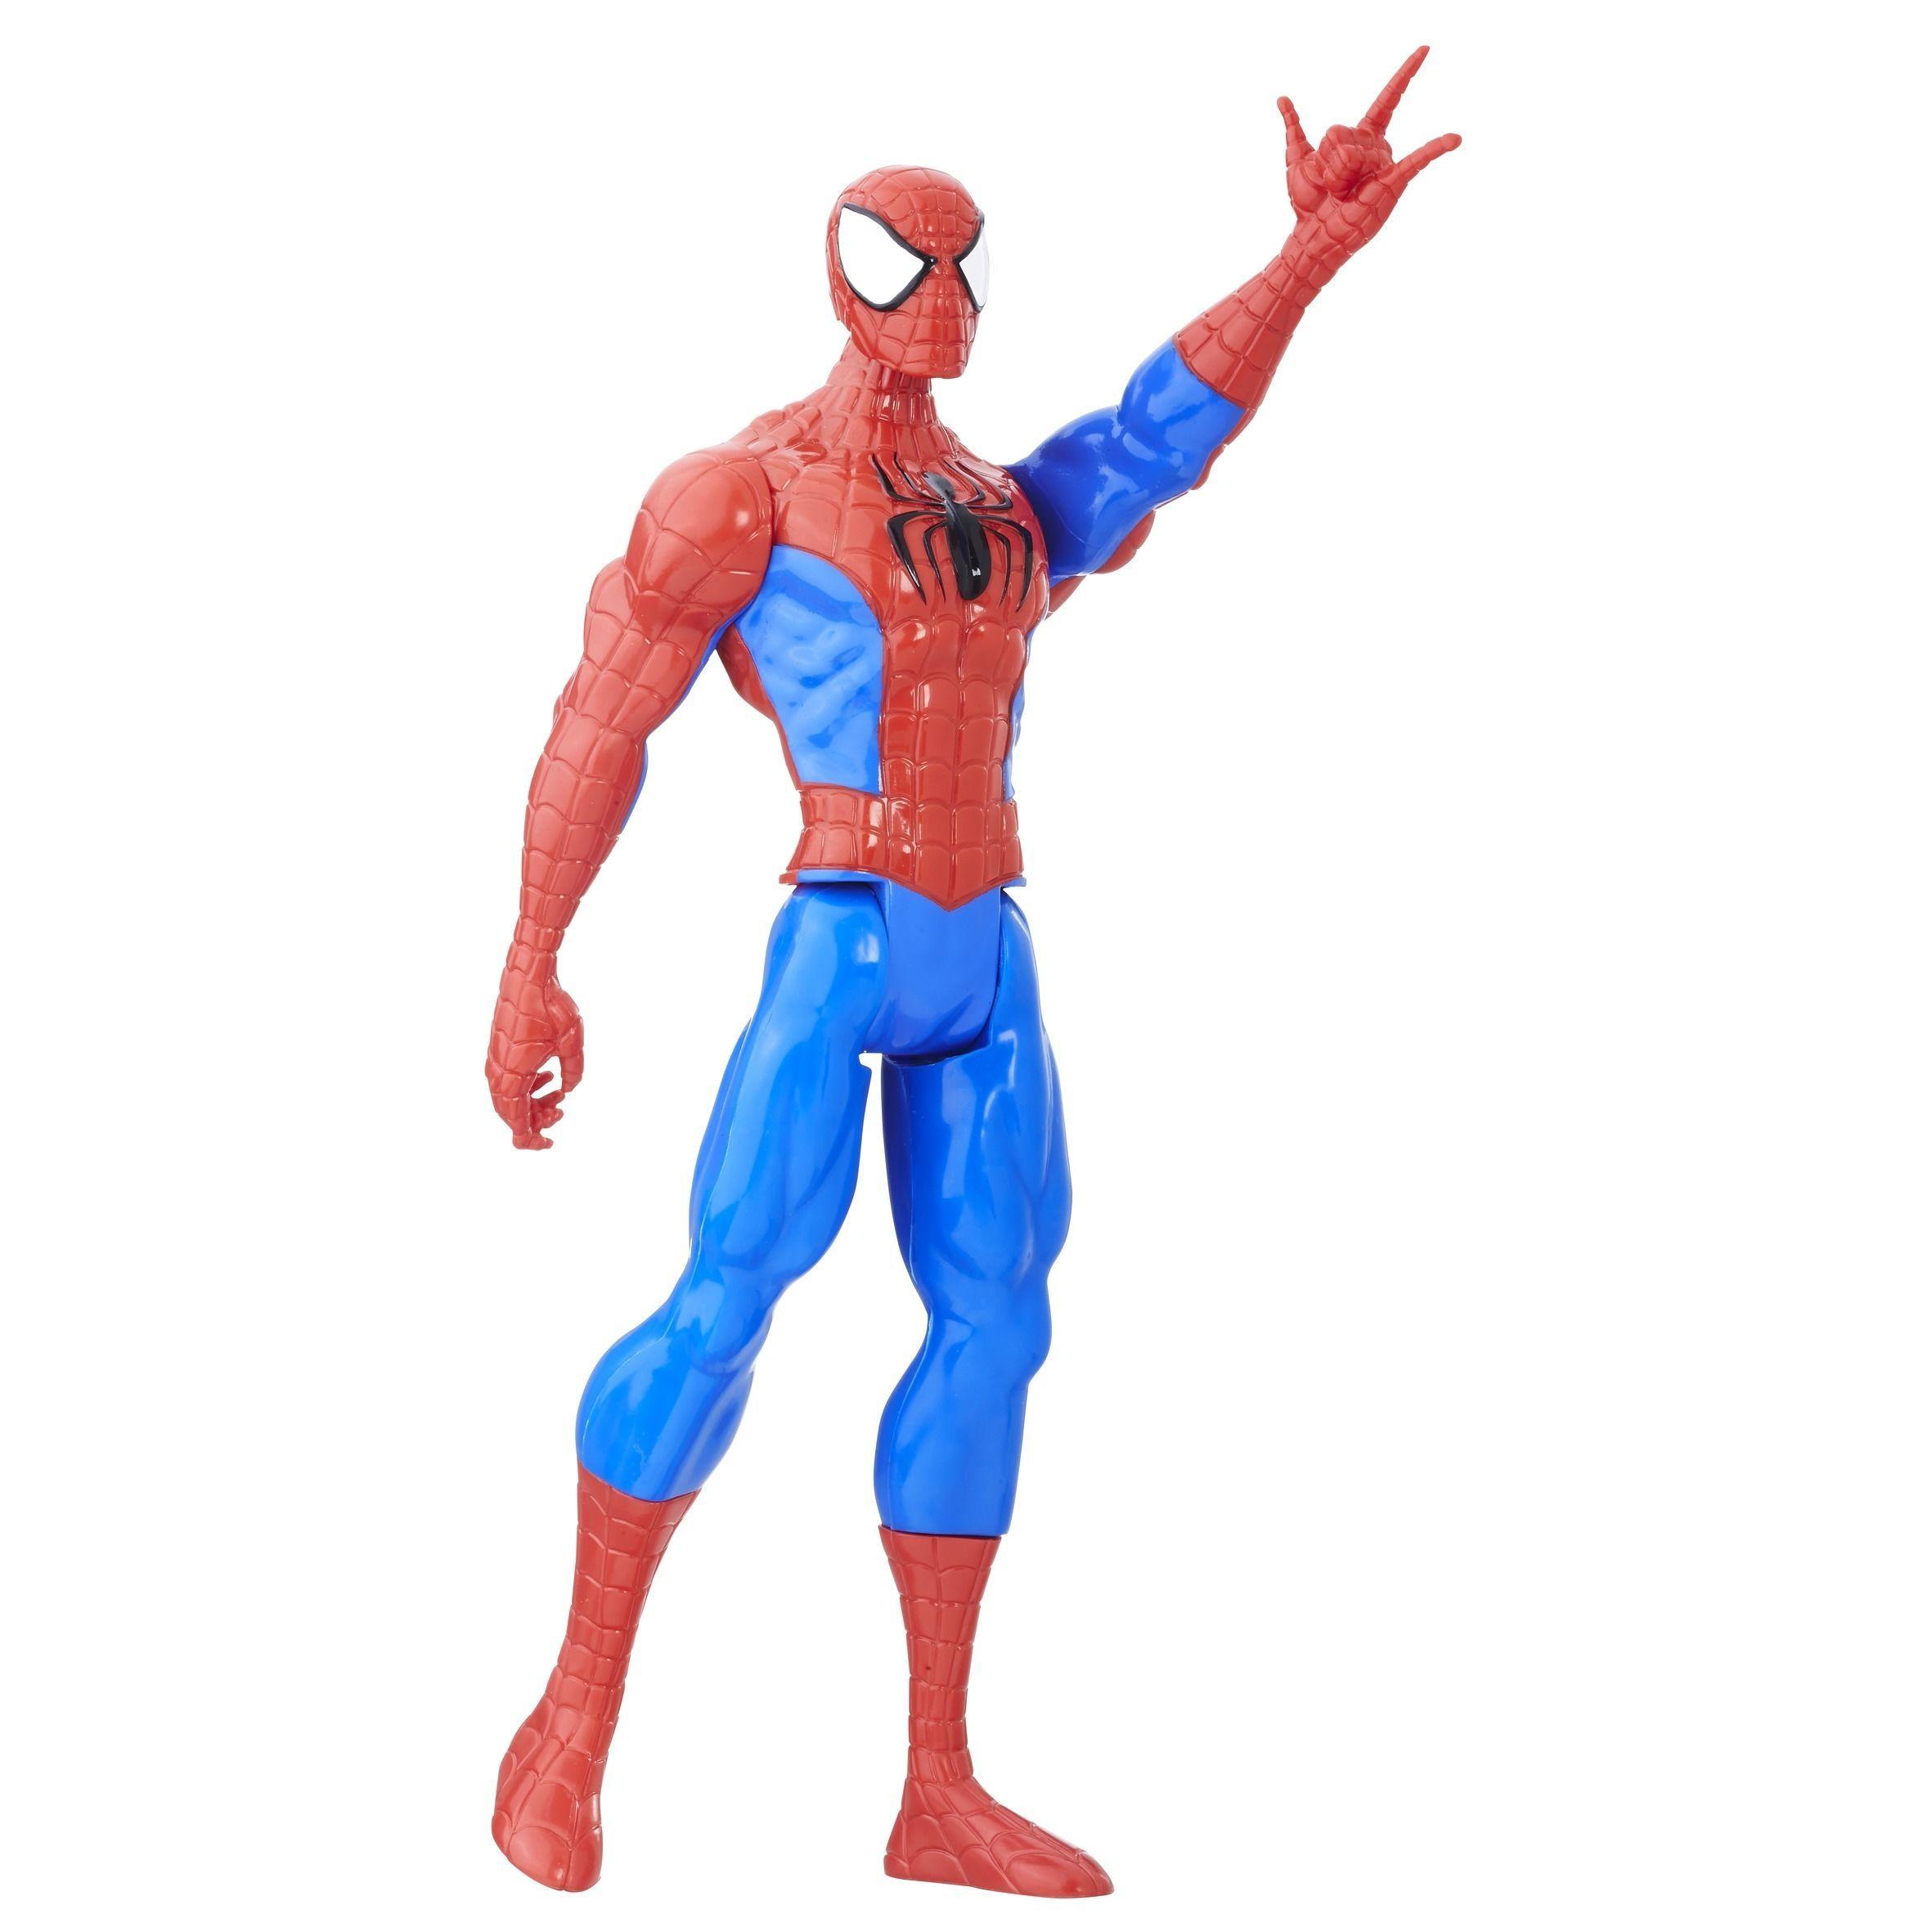 Spiderman Titan 30 cm - B9760EU40